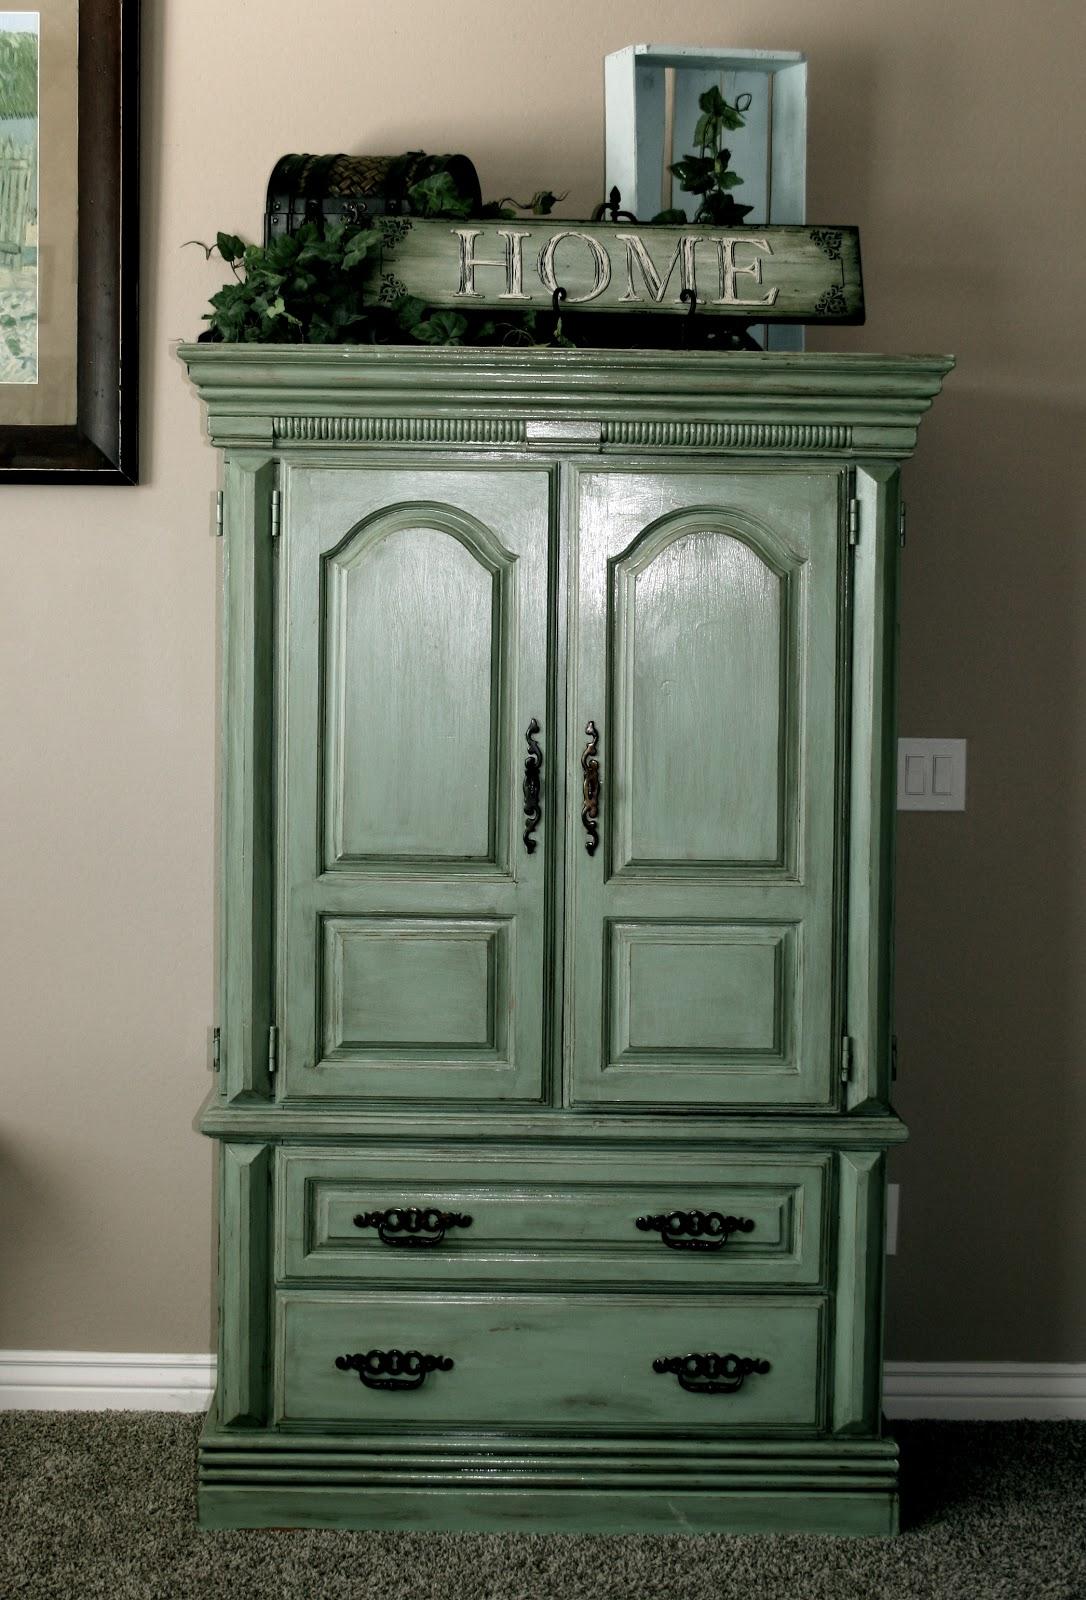 Little Bit of Paint: Repurposed Armoire